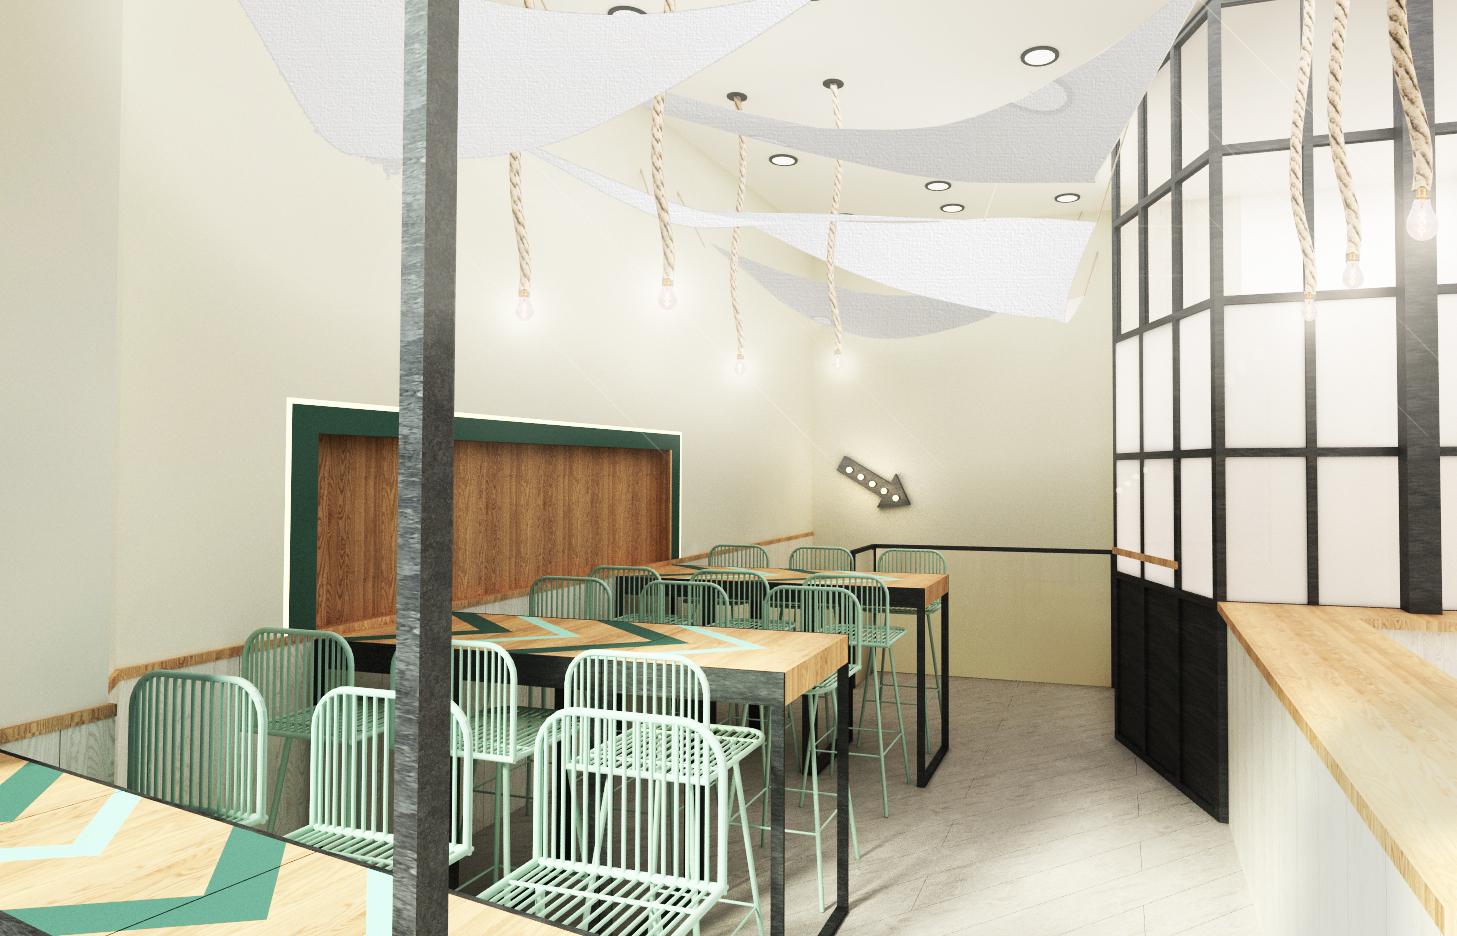 emmme studio restaurante Elcano renders planta alta.jpg